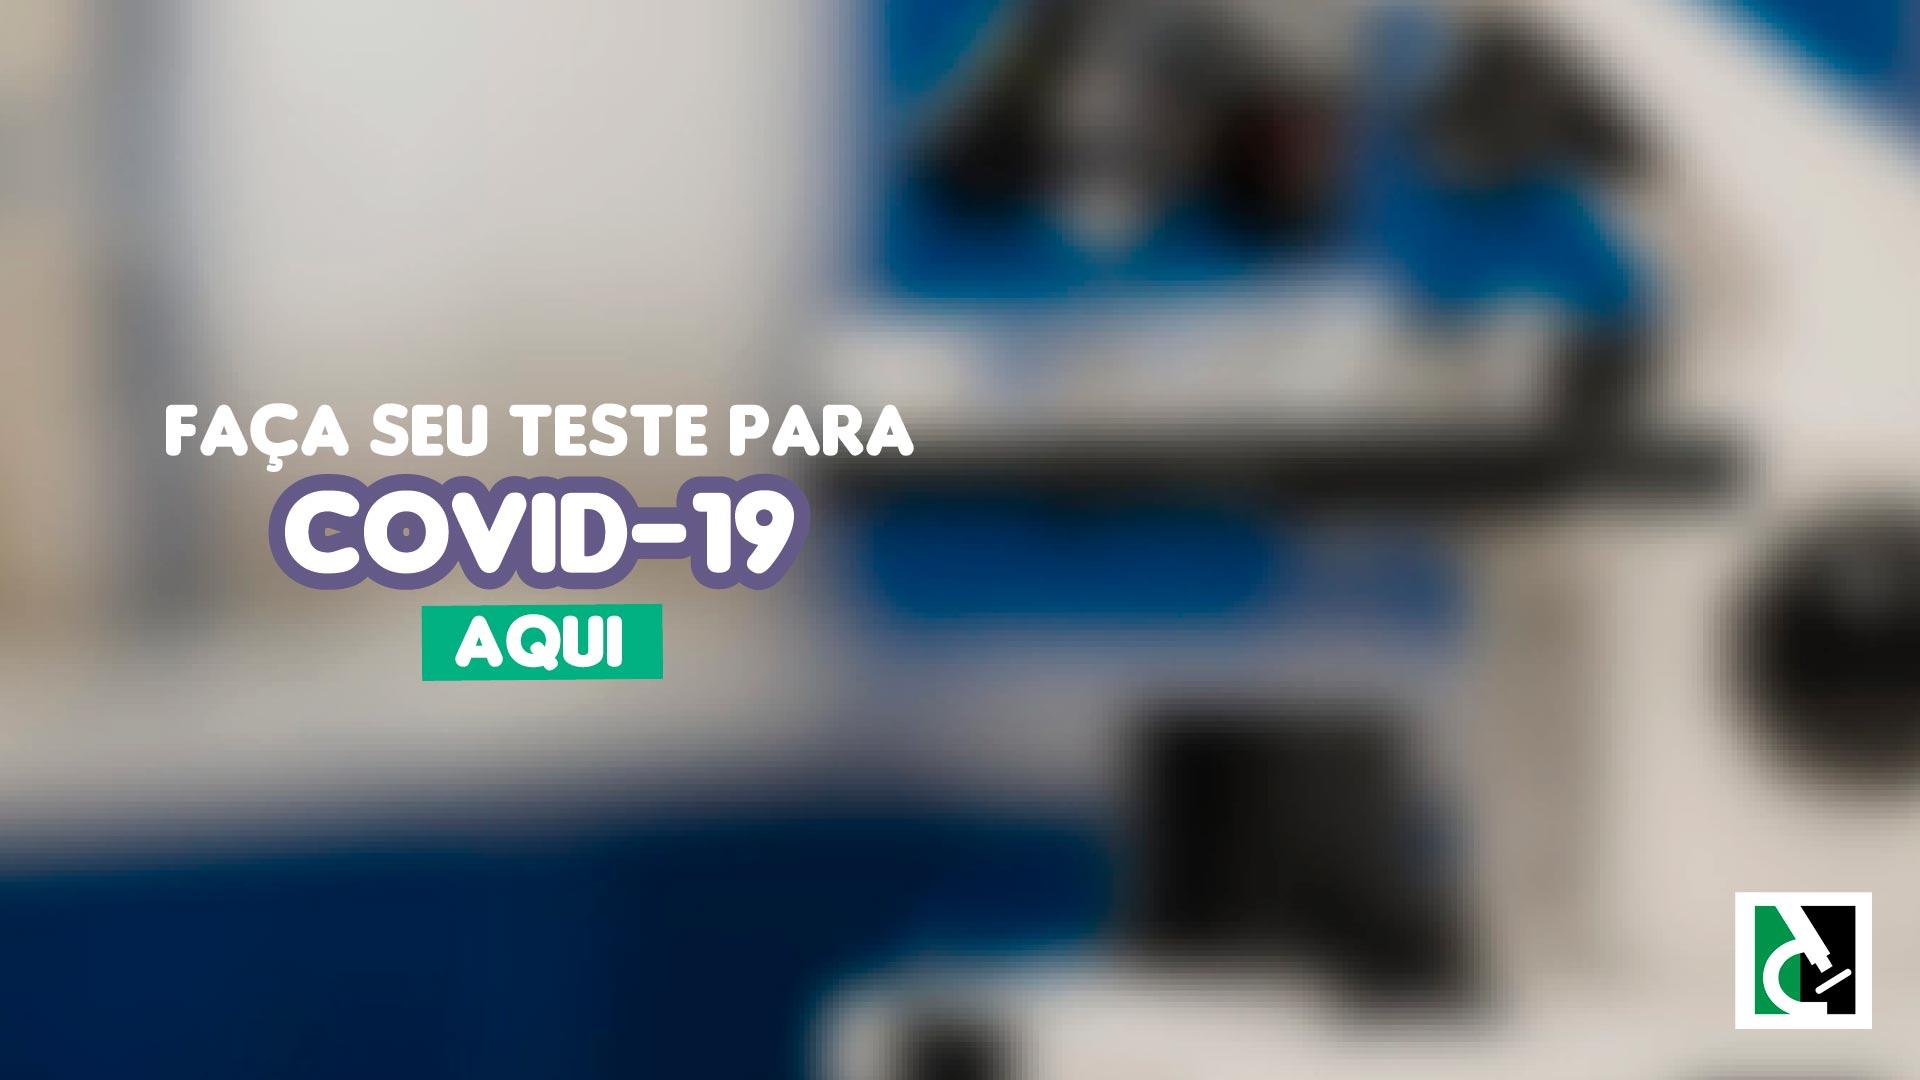 Laborato-Santa-Terezinha-Analises-Clinicas-Barbacena-covid19